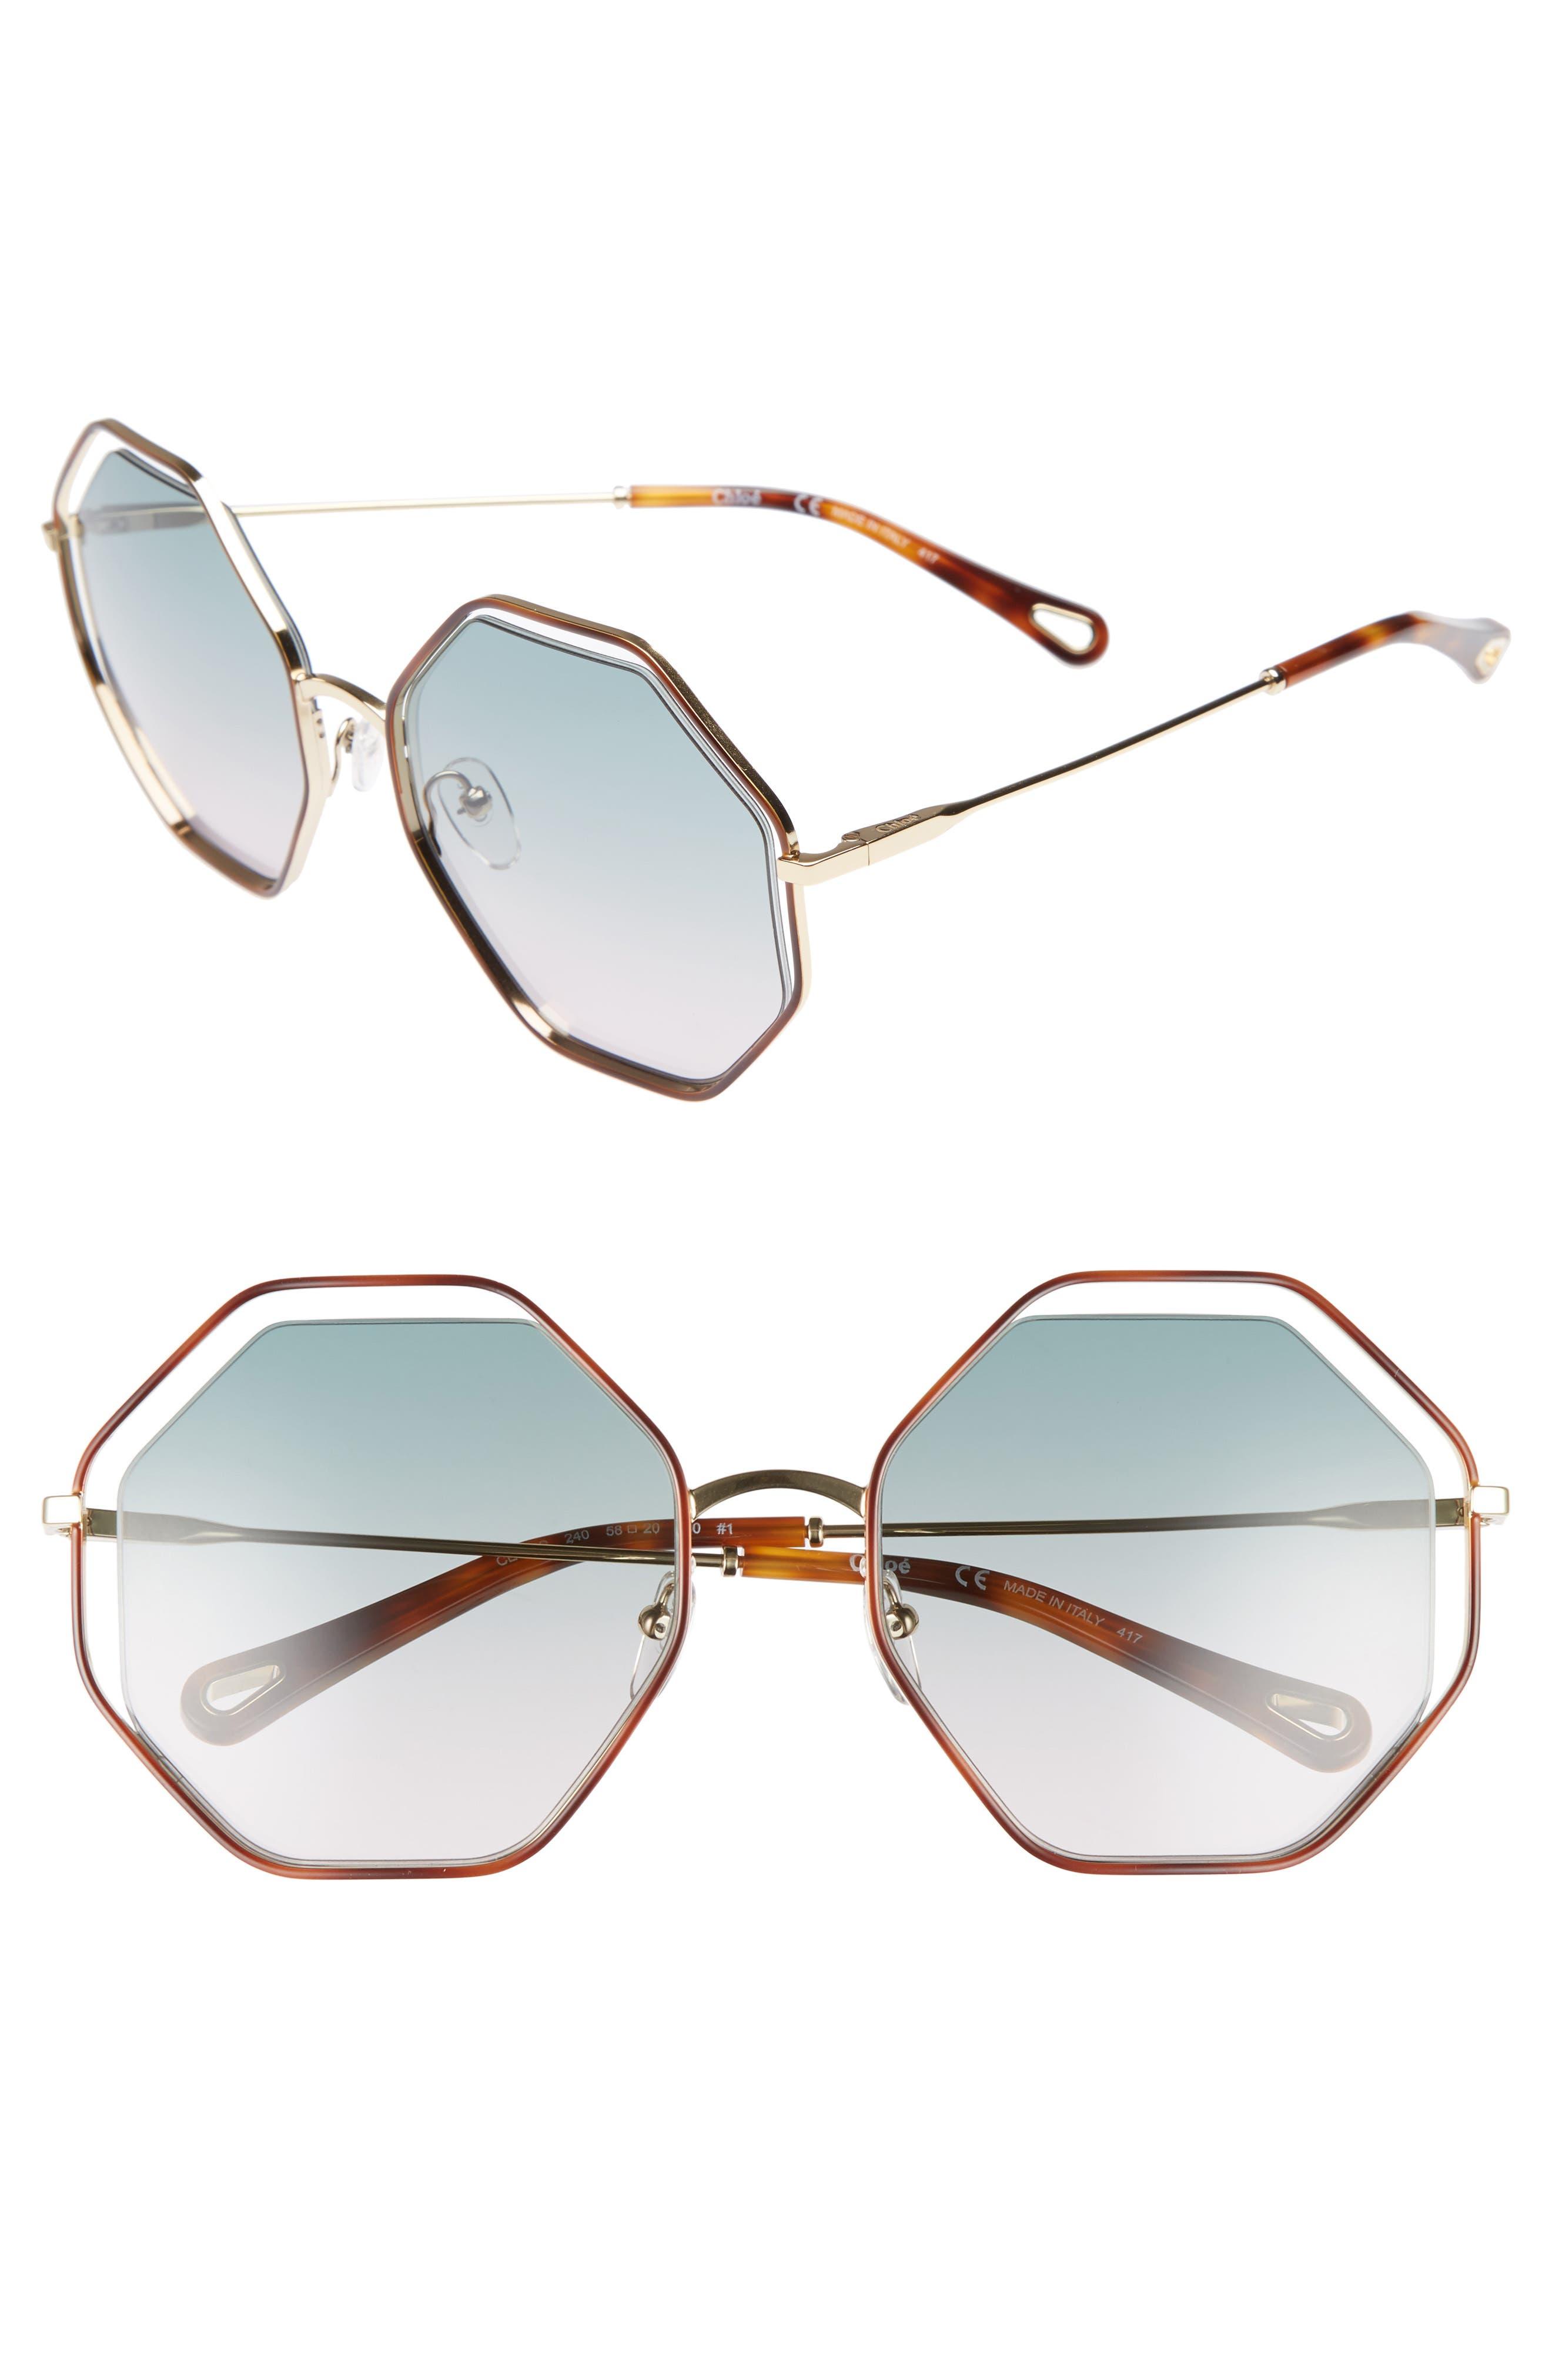 Chloe 5m Octagonal Halo Lens Sunglasses - Havana/ Green Rose